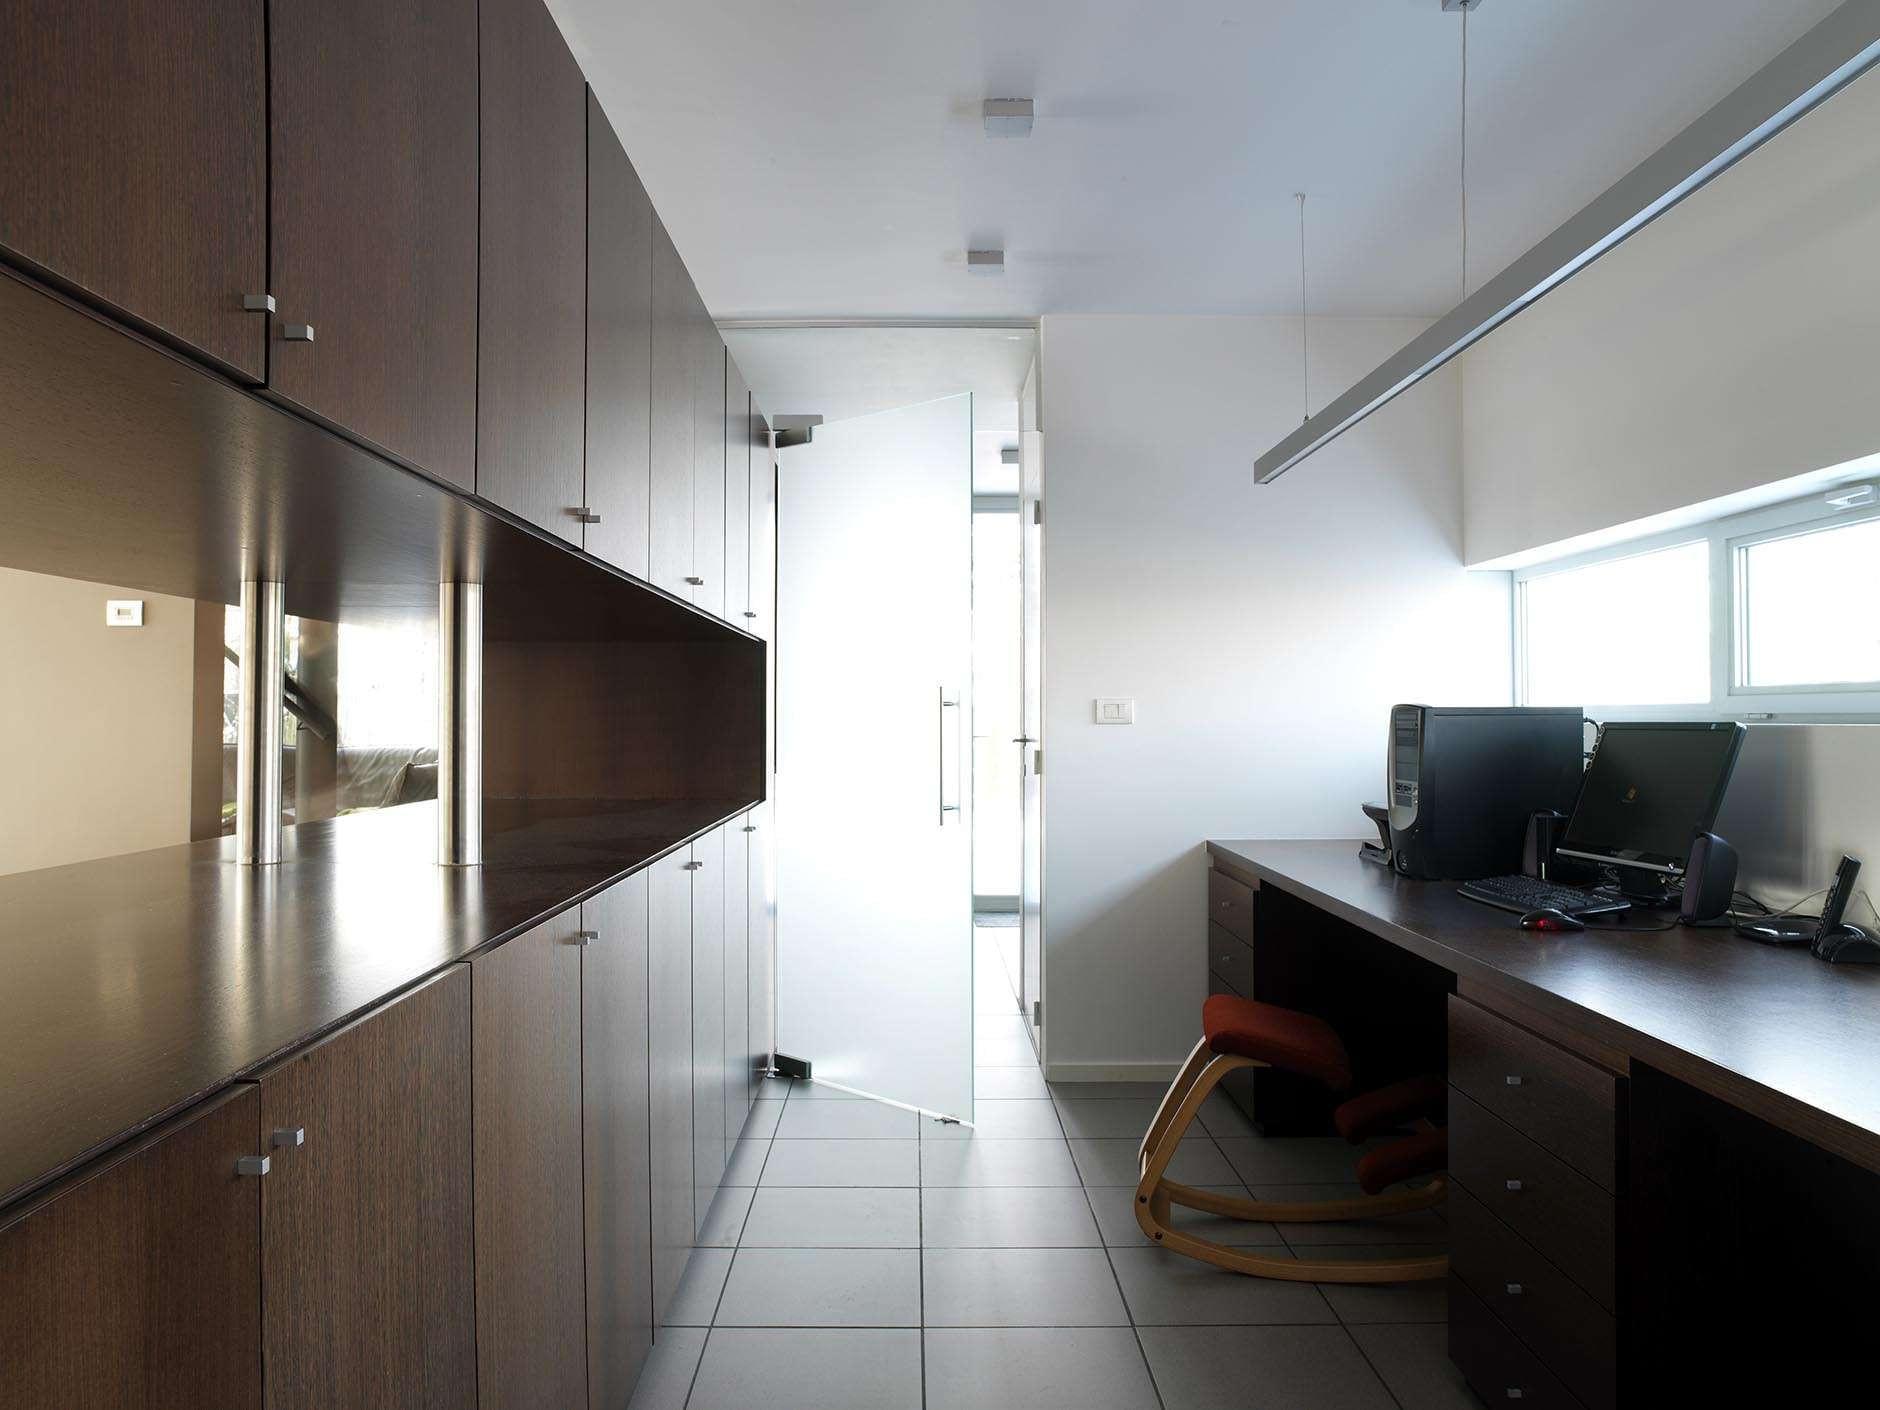 bureau-kastenwand-glazen-deur